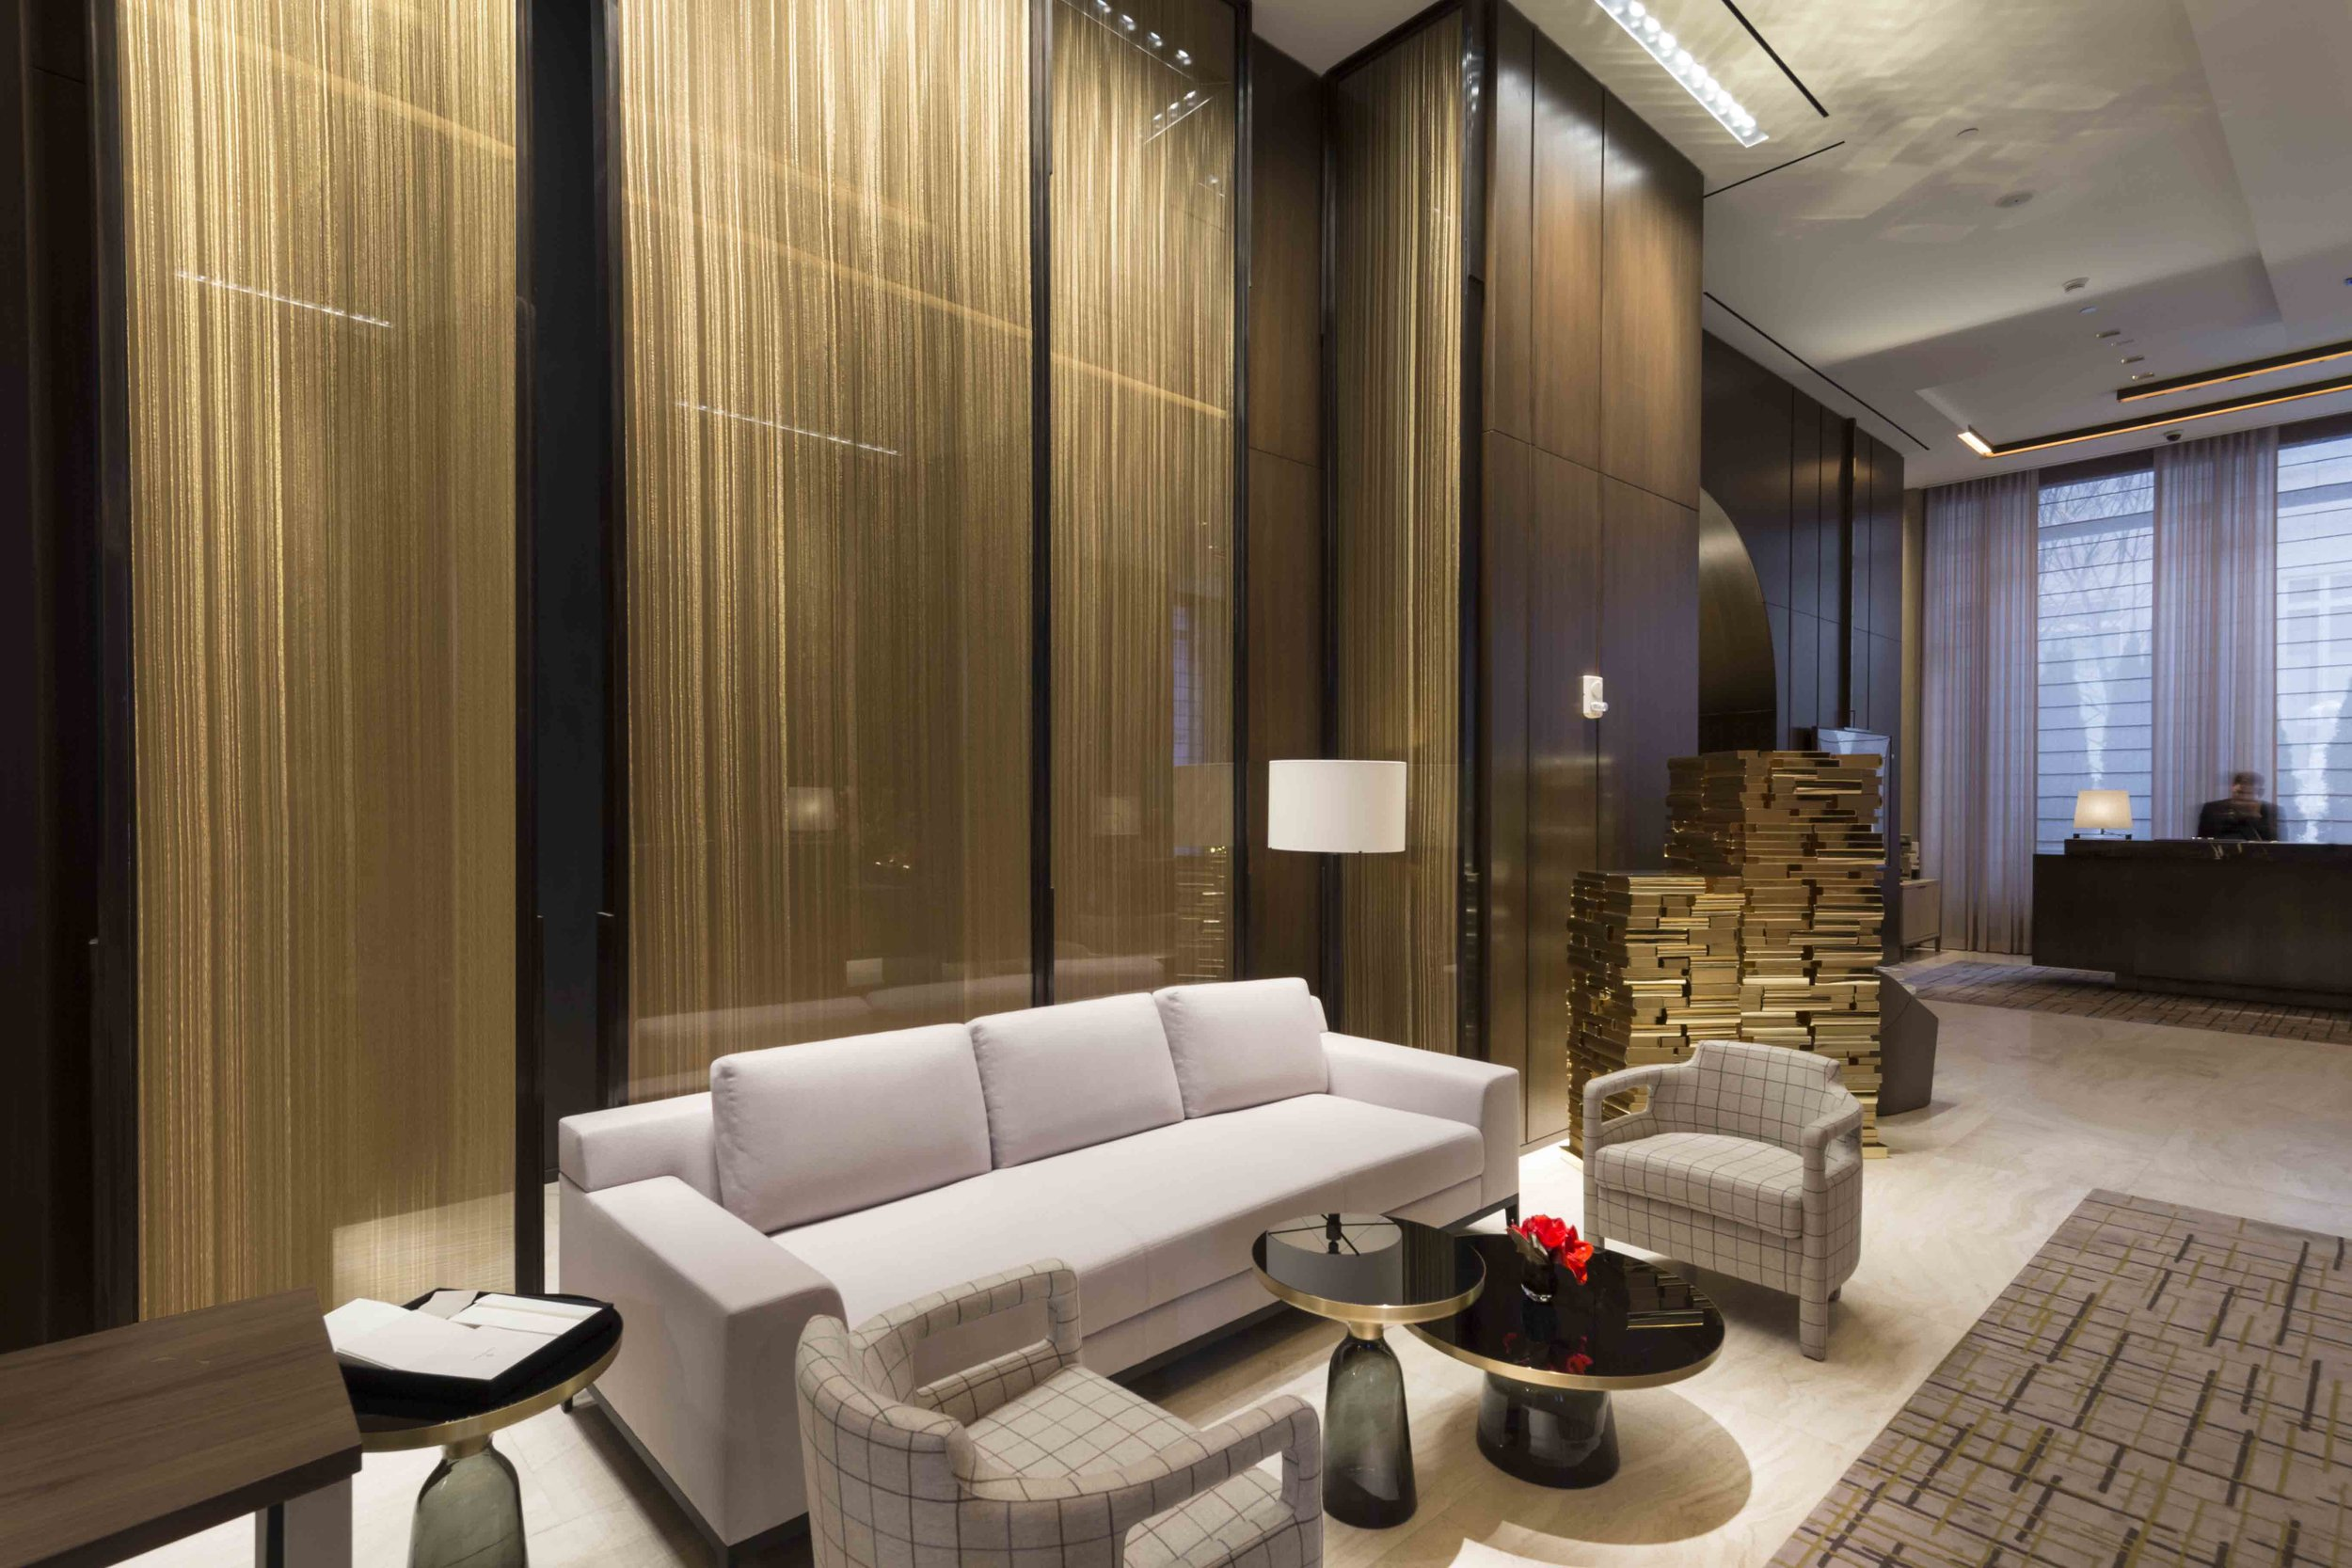 Sophie-Mallebranche-Hospitality-Glass-Laminations-New-York-Luxury